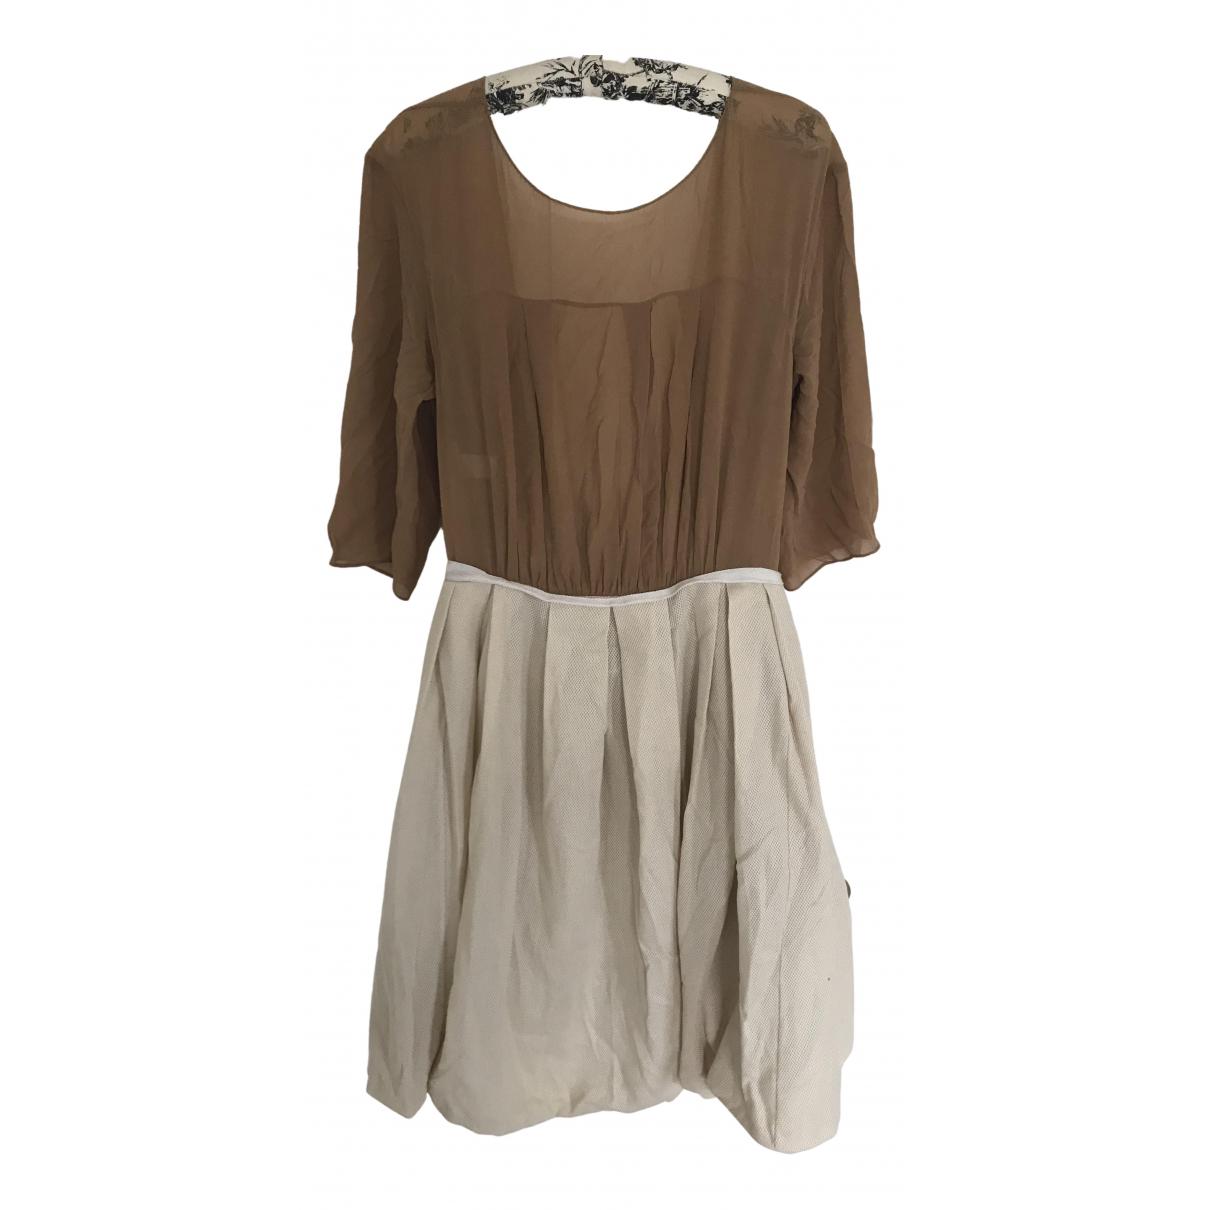 Marni \N Kleid in  Kamel Synthetik